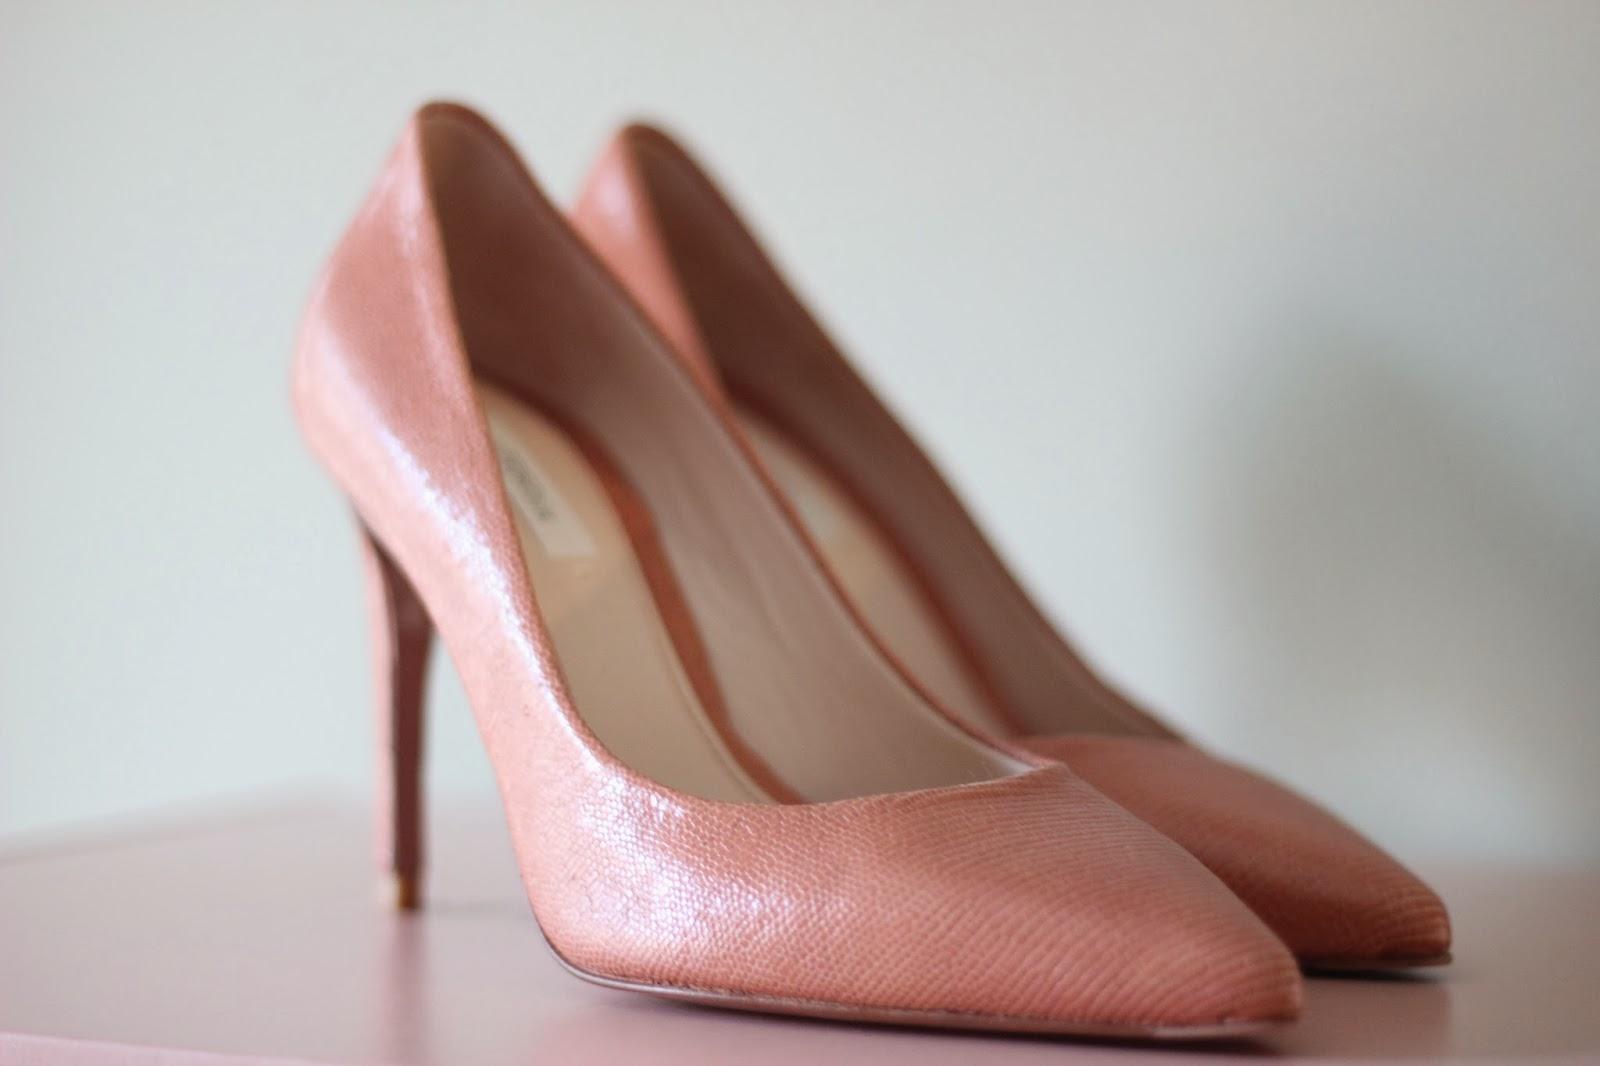 photo zapatos nude uterque